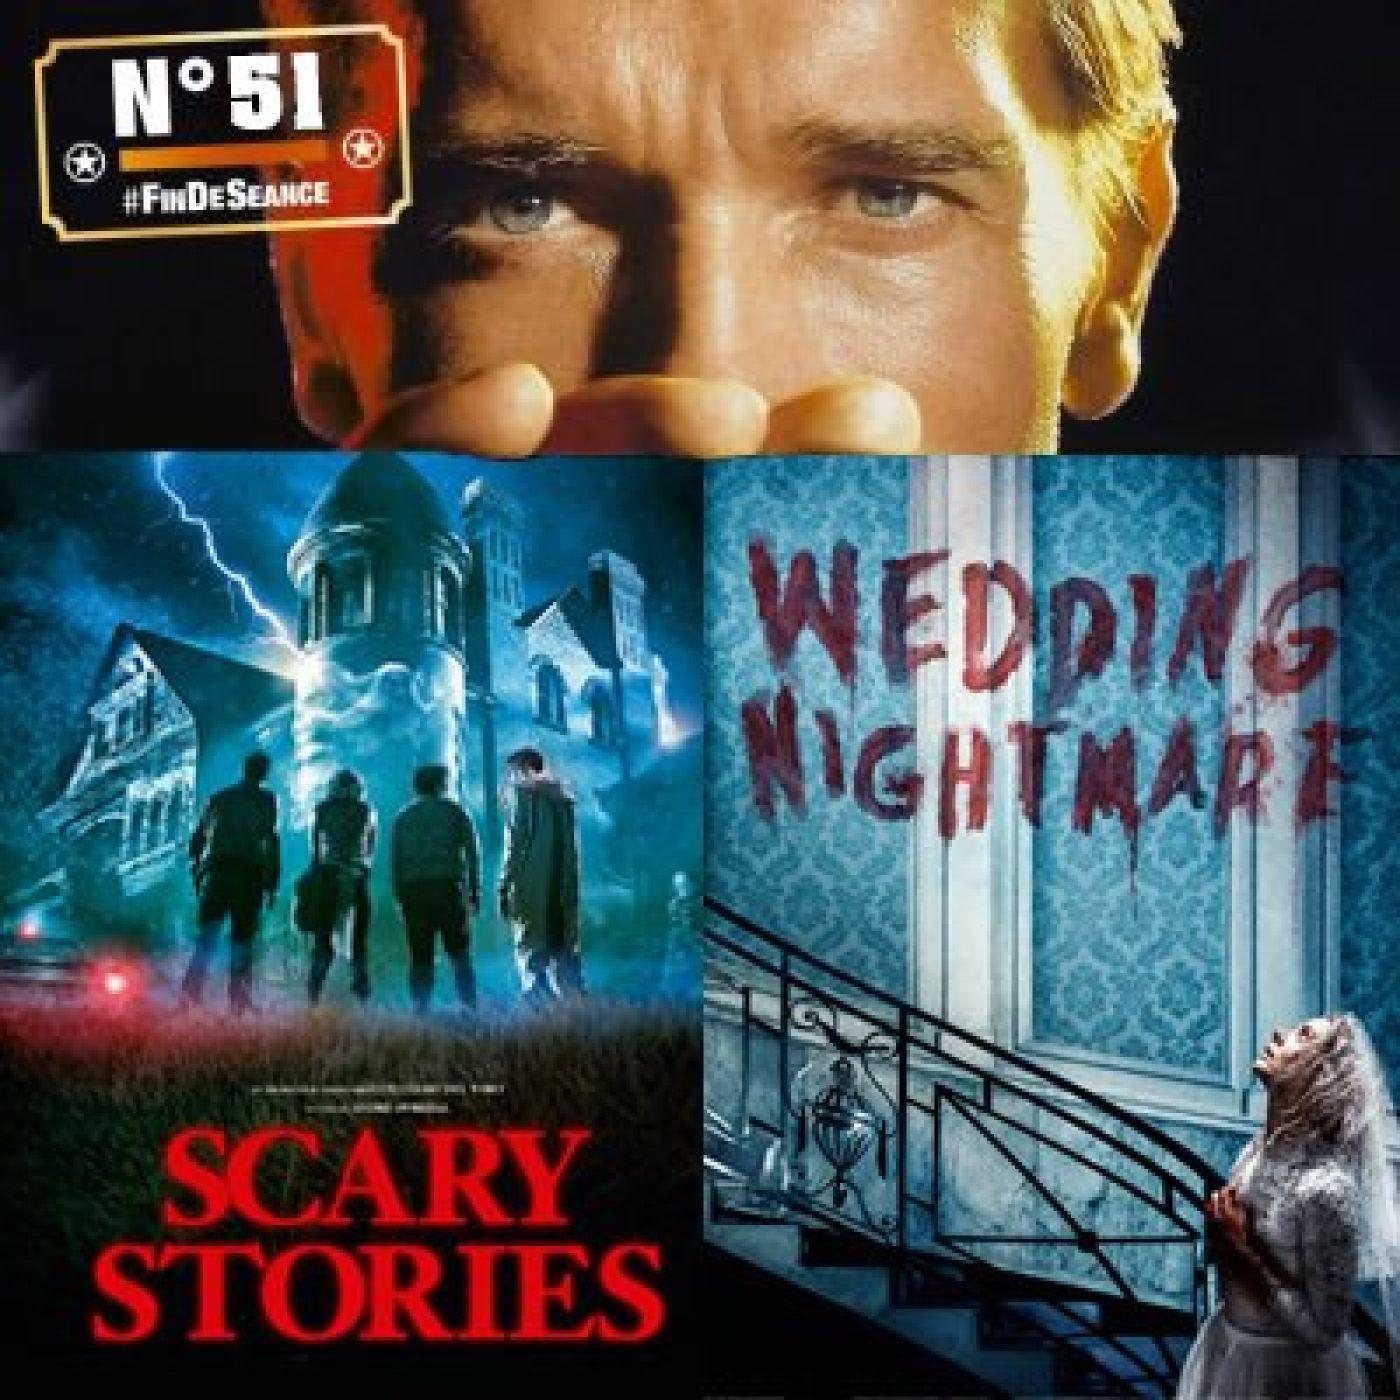 #51 SCARY STORIES & WEDDING NIGHTMARE : Étripe-moi si tu peux !